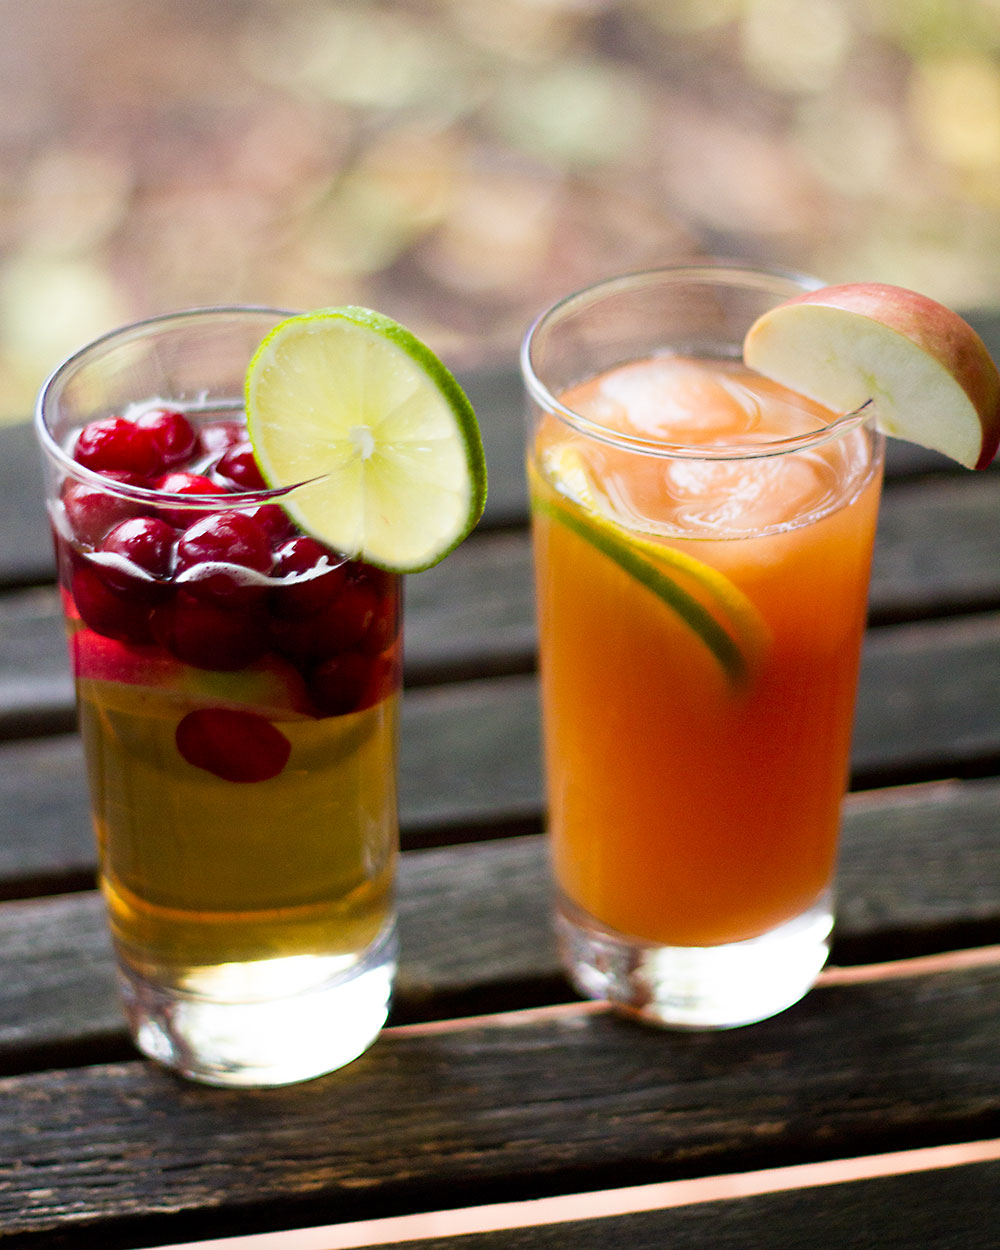 bob-le-chef-quebec-punch-espace-cocktail-saq